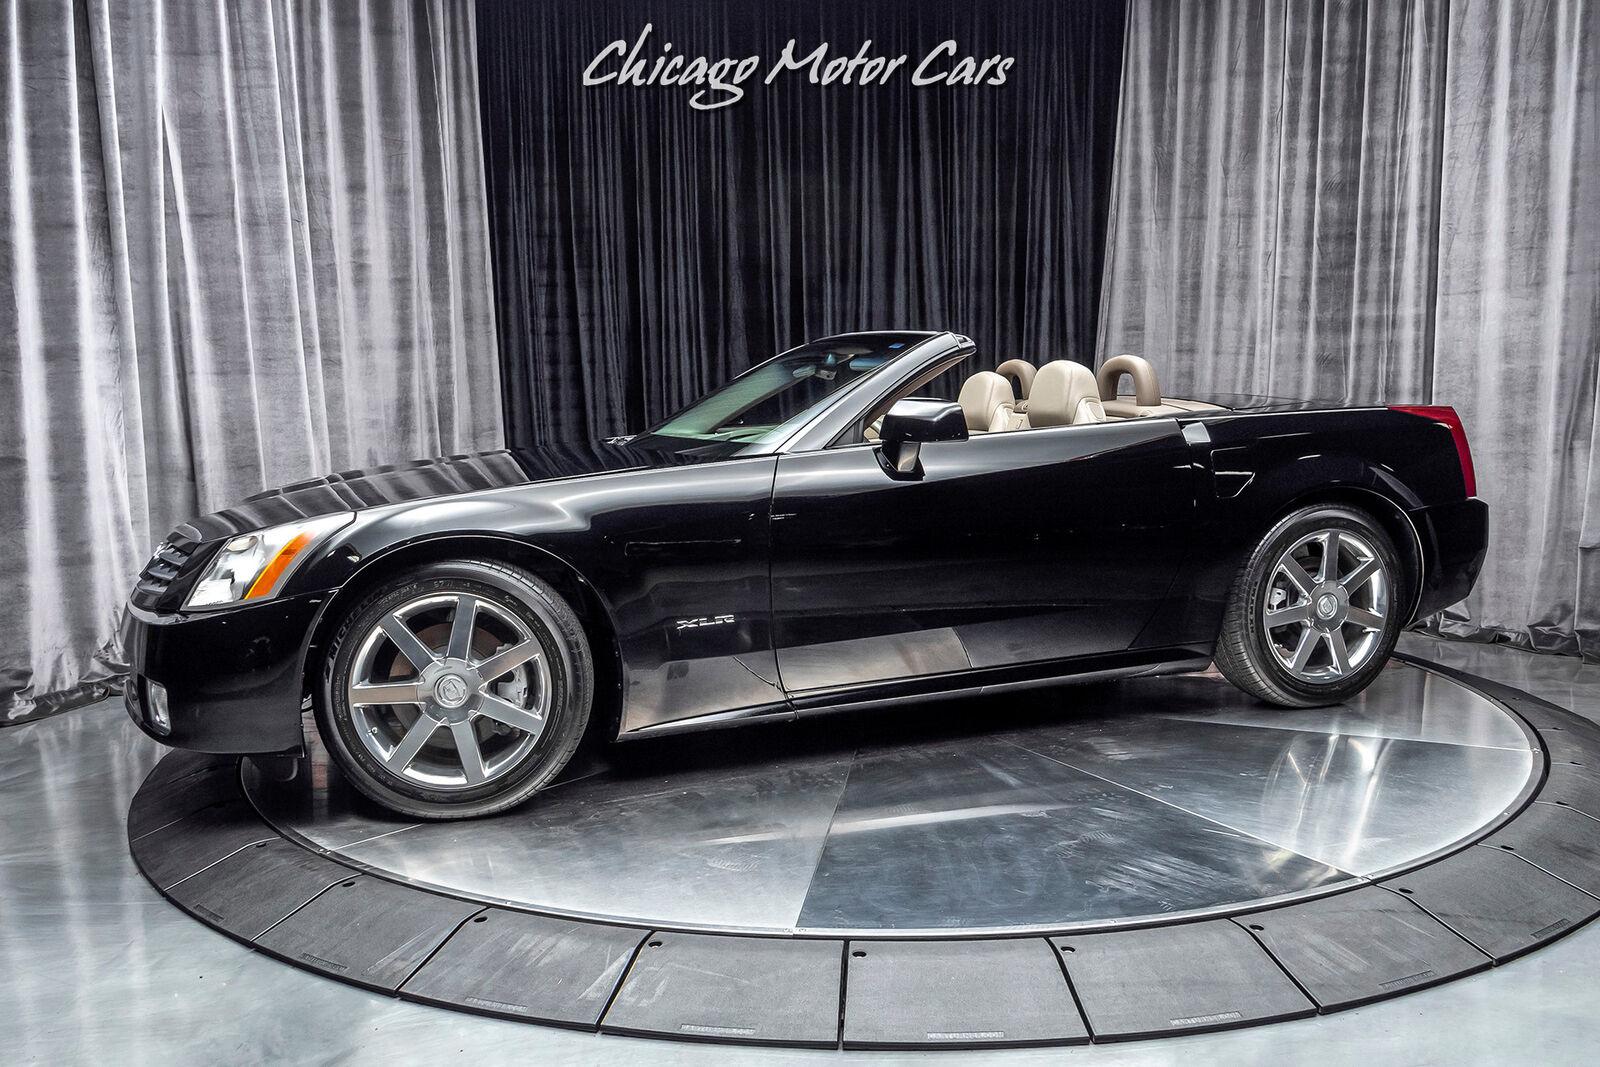 2004 Cadillac XLR Hardtop Convertible MSRP $75,385 RARE EXAMPLE! 16K Black Raven